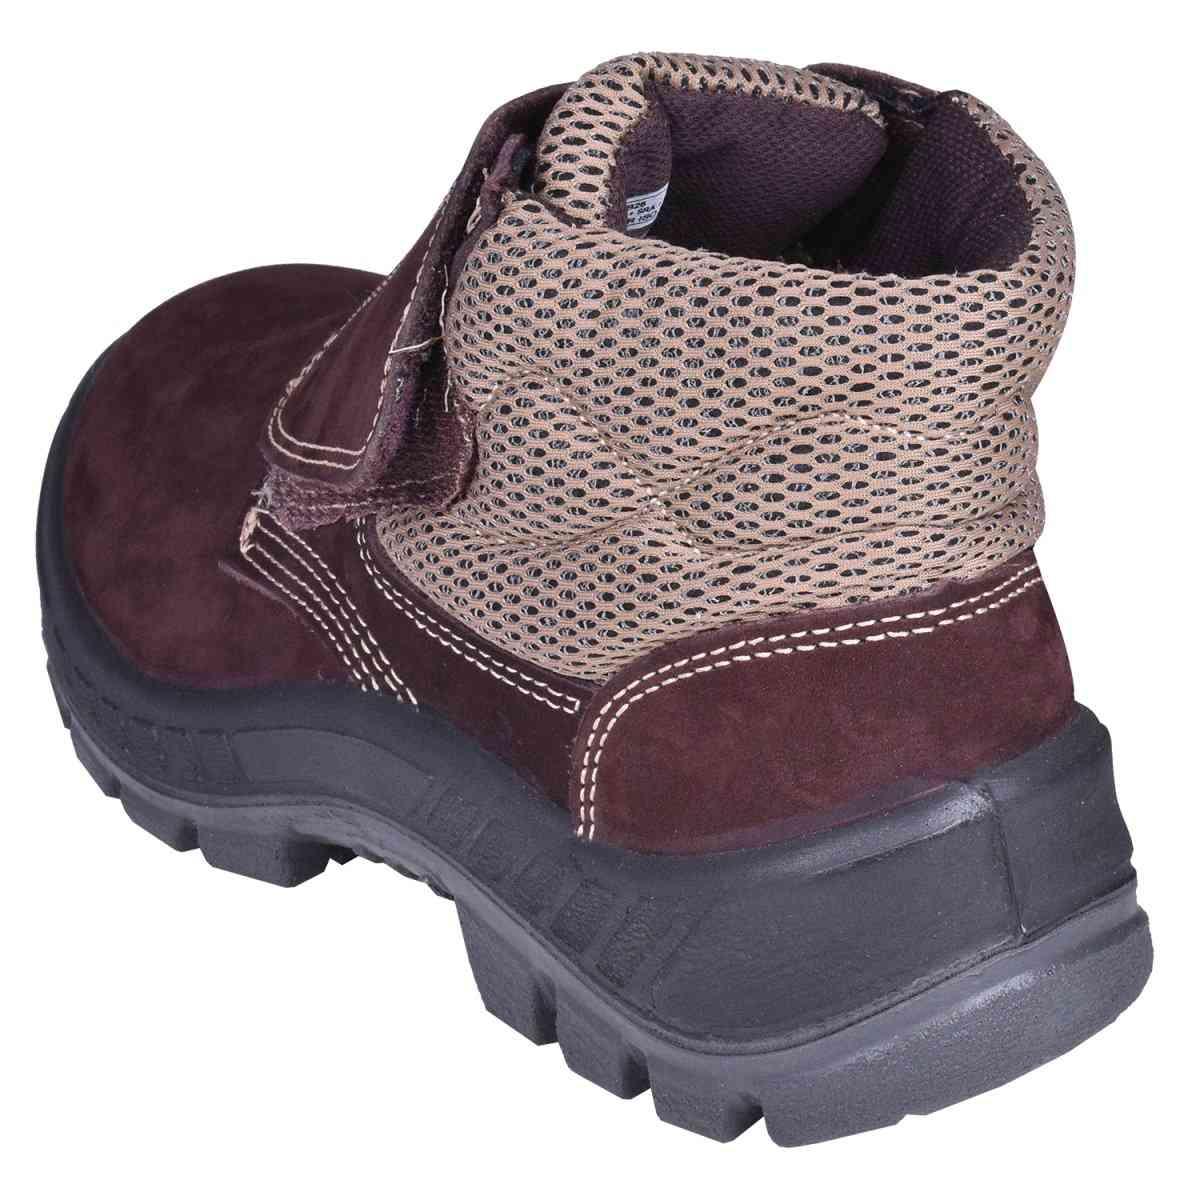 Botina Nobuck Com Velcro Marluvas - Nº 44